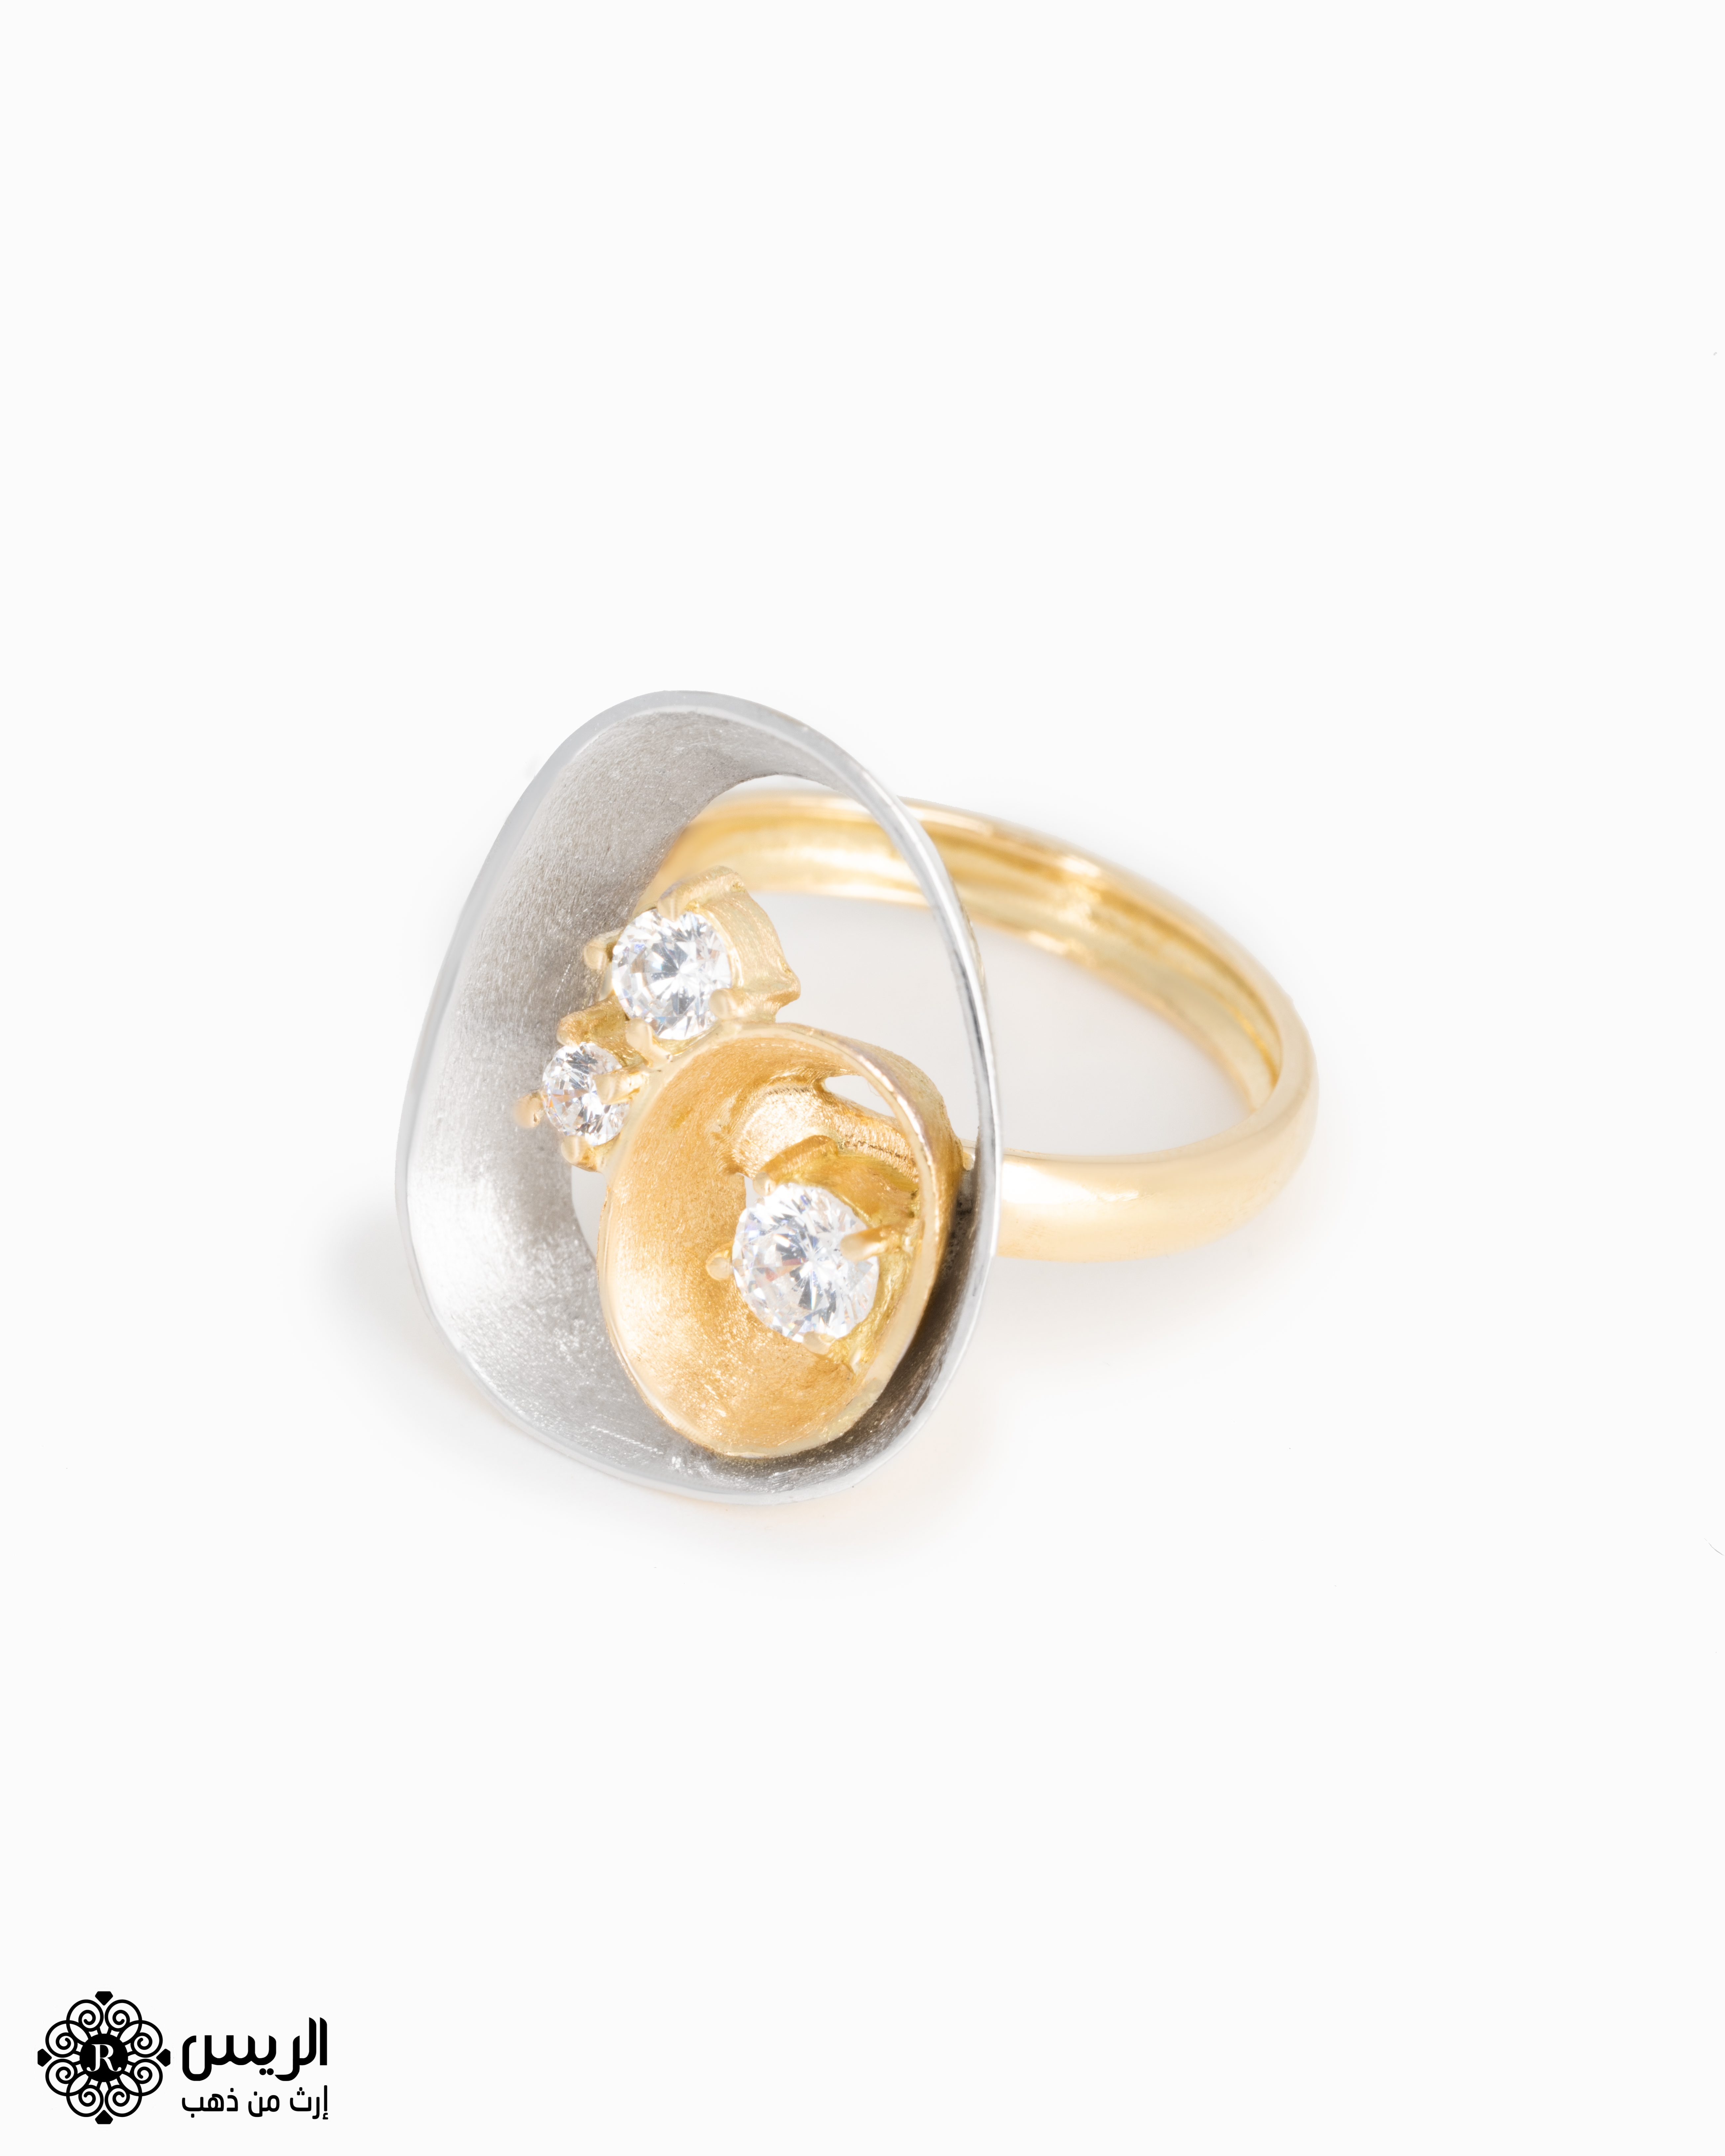 Raies jewelry Half Set نصف طقم الريس للمجوهرات